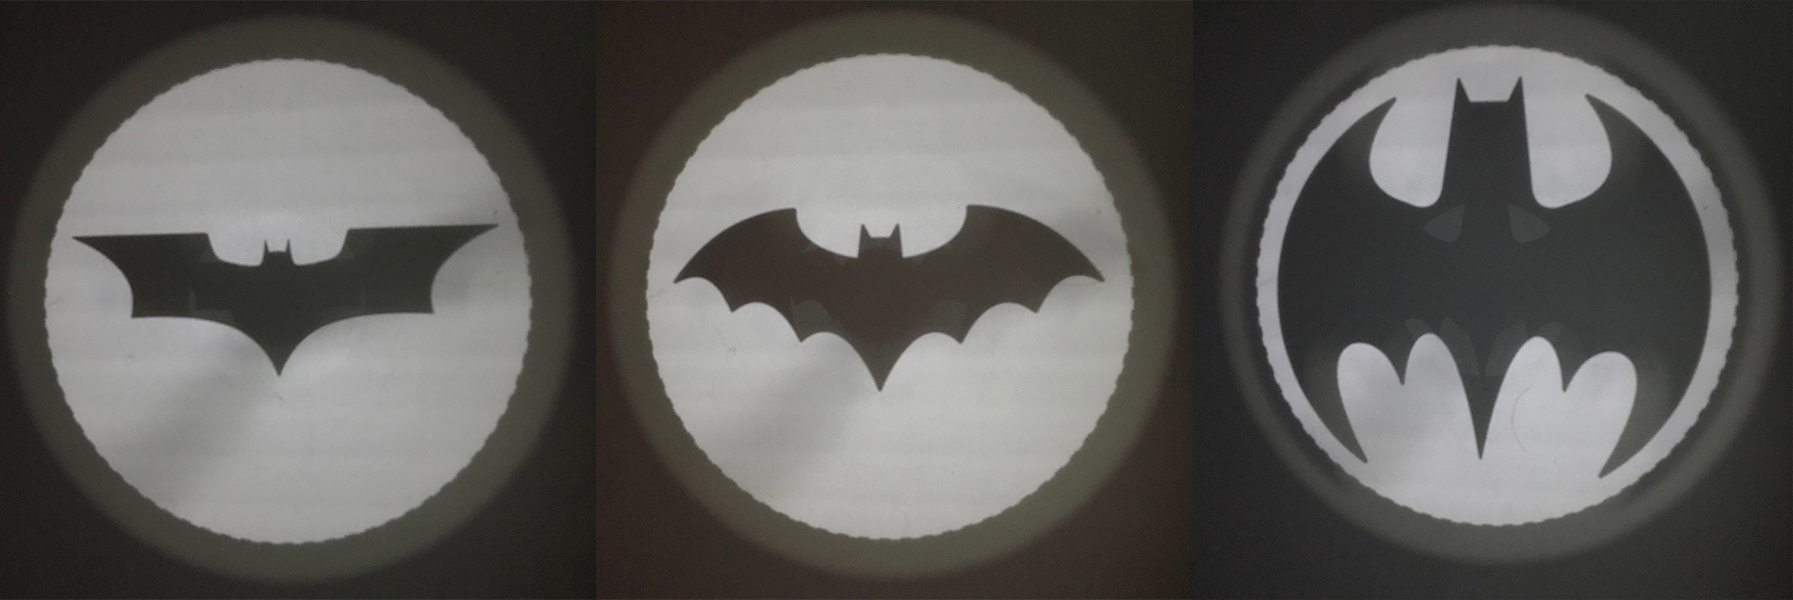 Bat Symbols \ Image: Dakster Sullivan